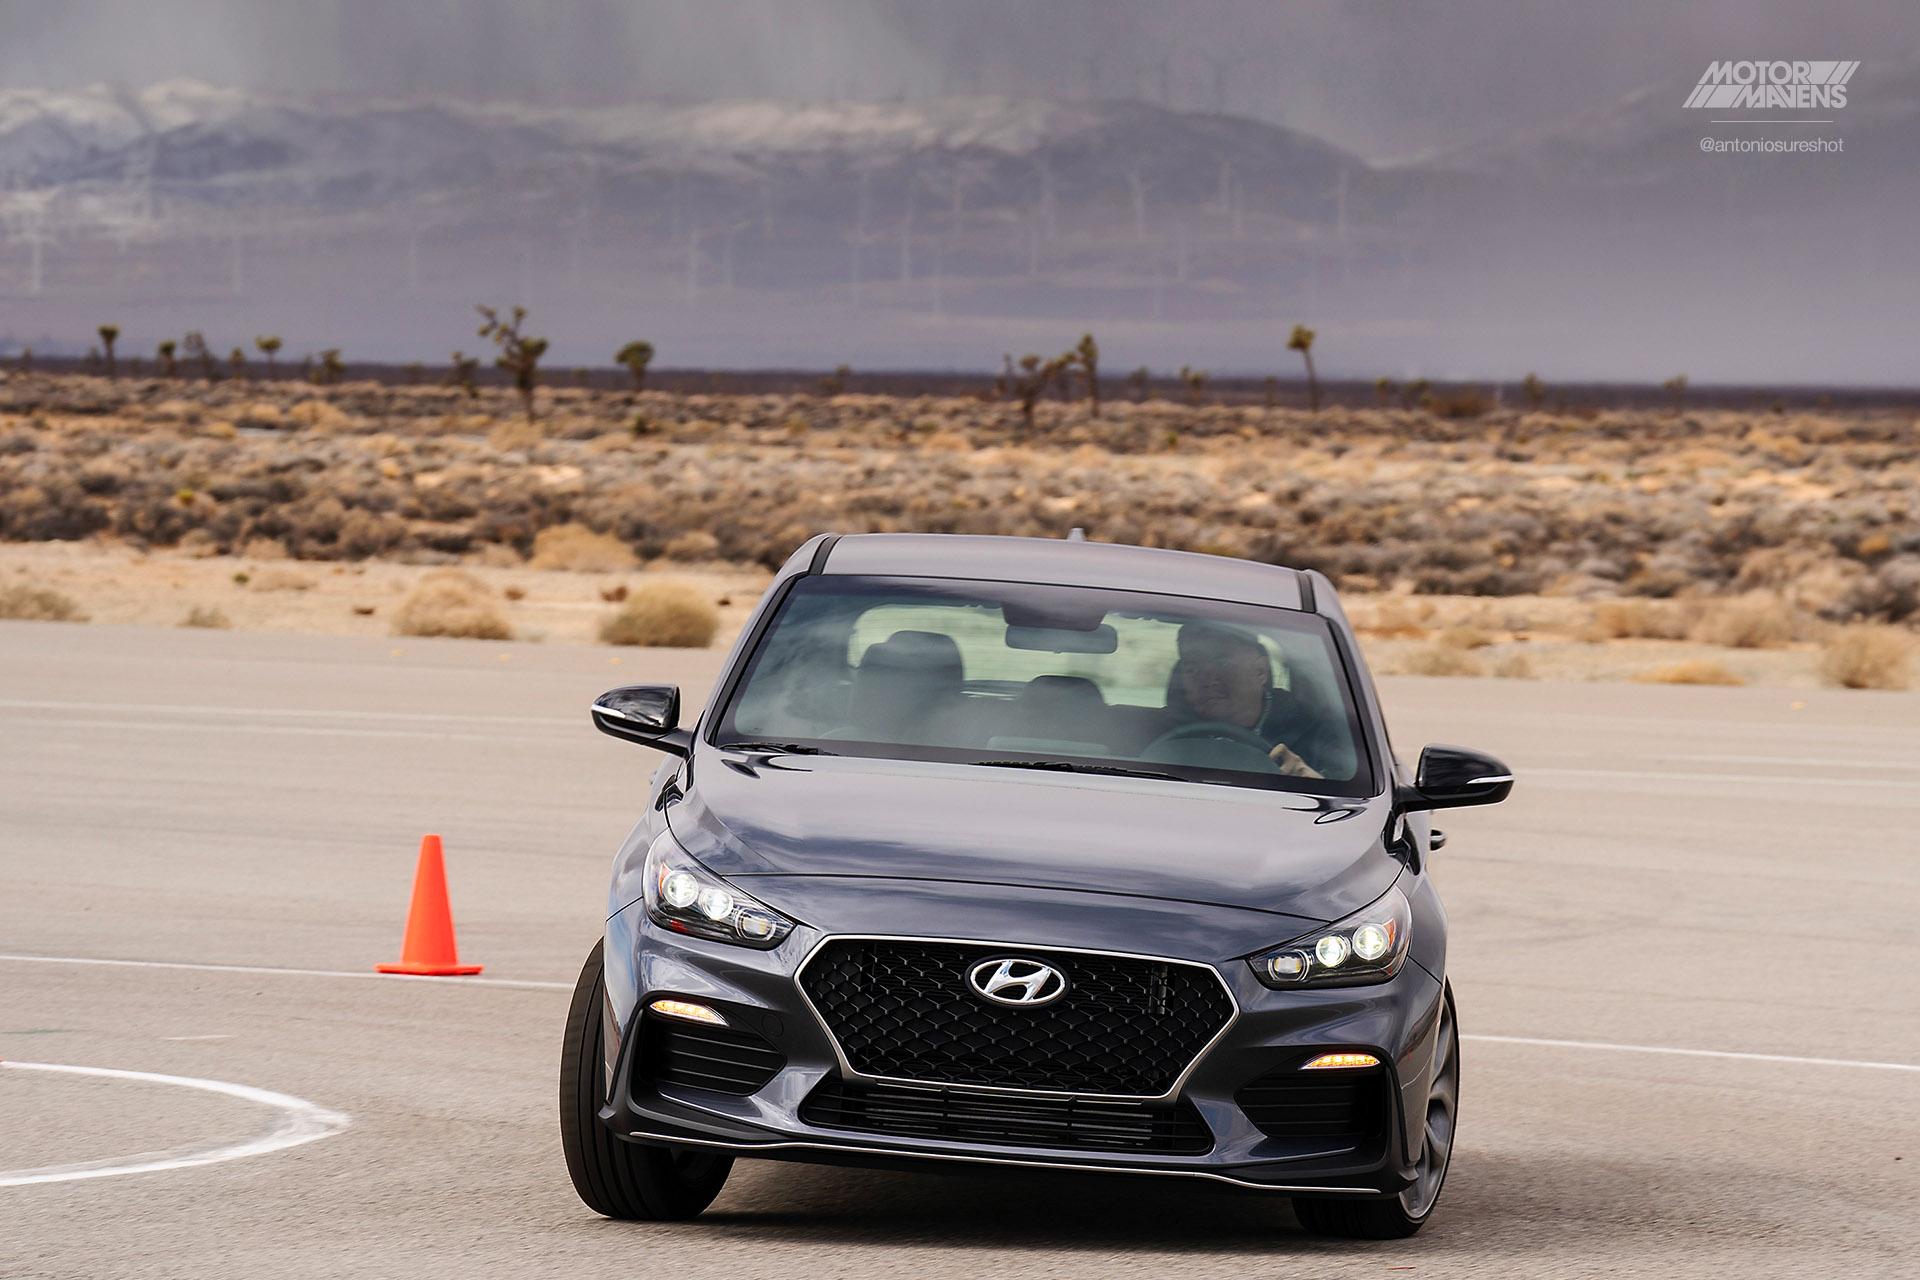 autocross, autox, Hyundai Test Track, Elantra GT